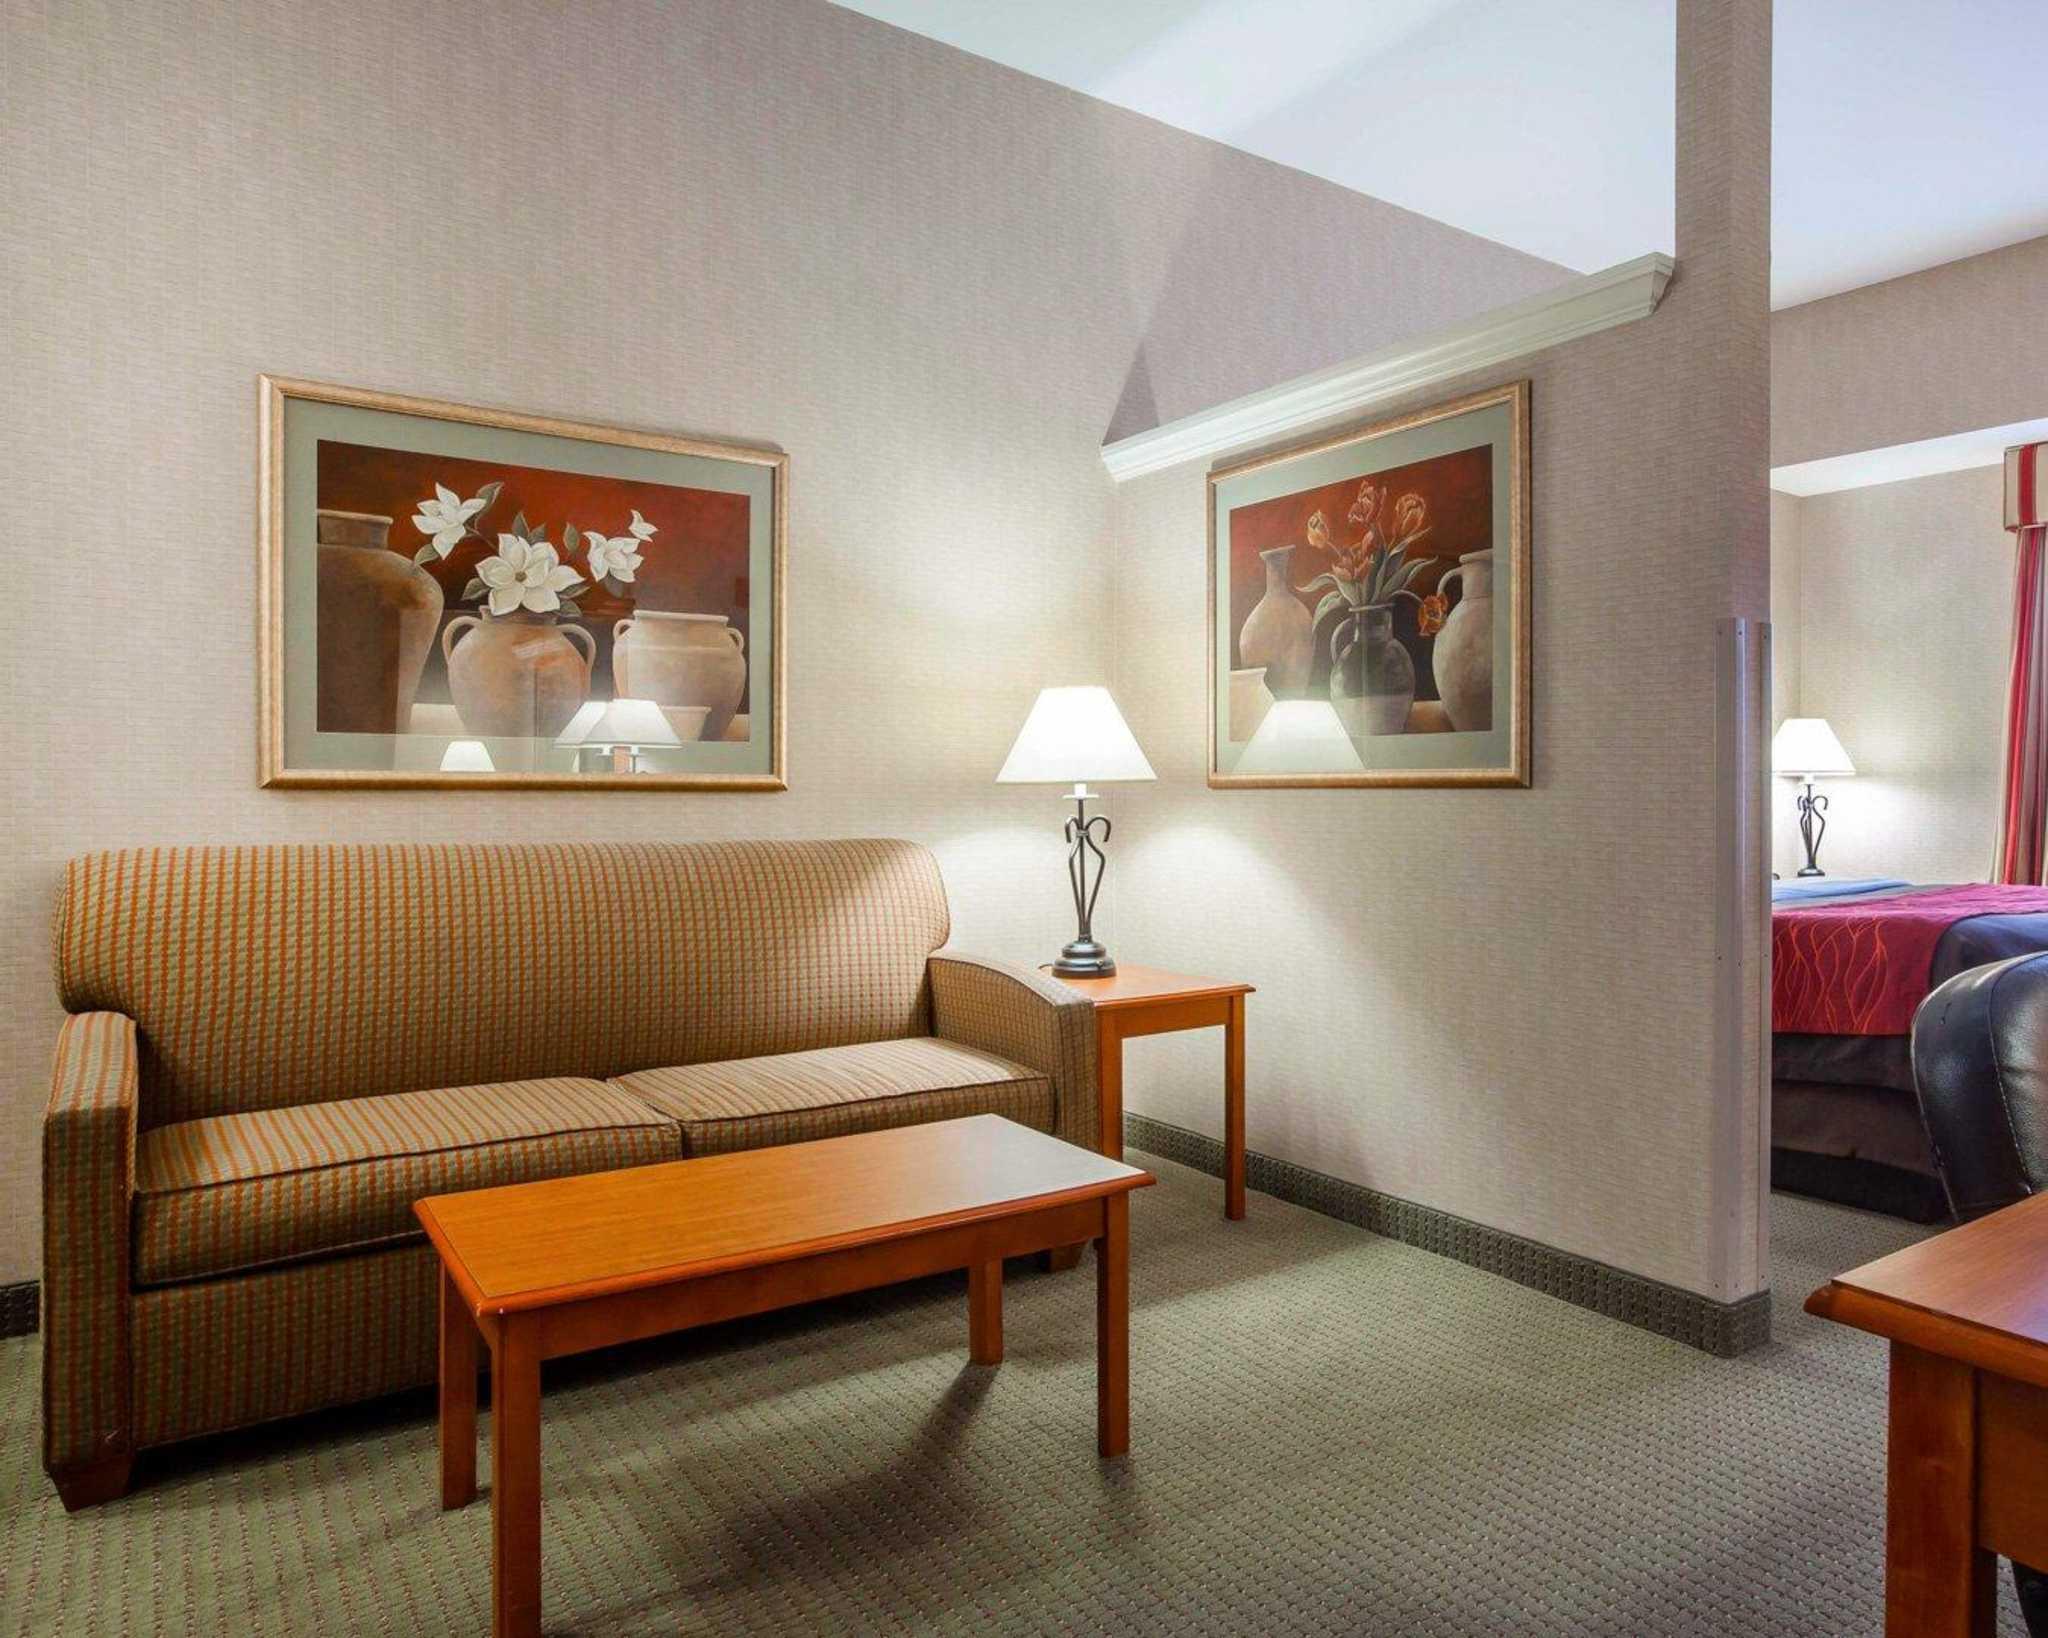 Comfort Inn & Suites adj to Akwesasne Mohawk Casino image 51